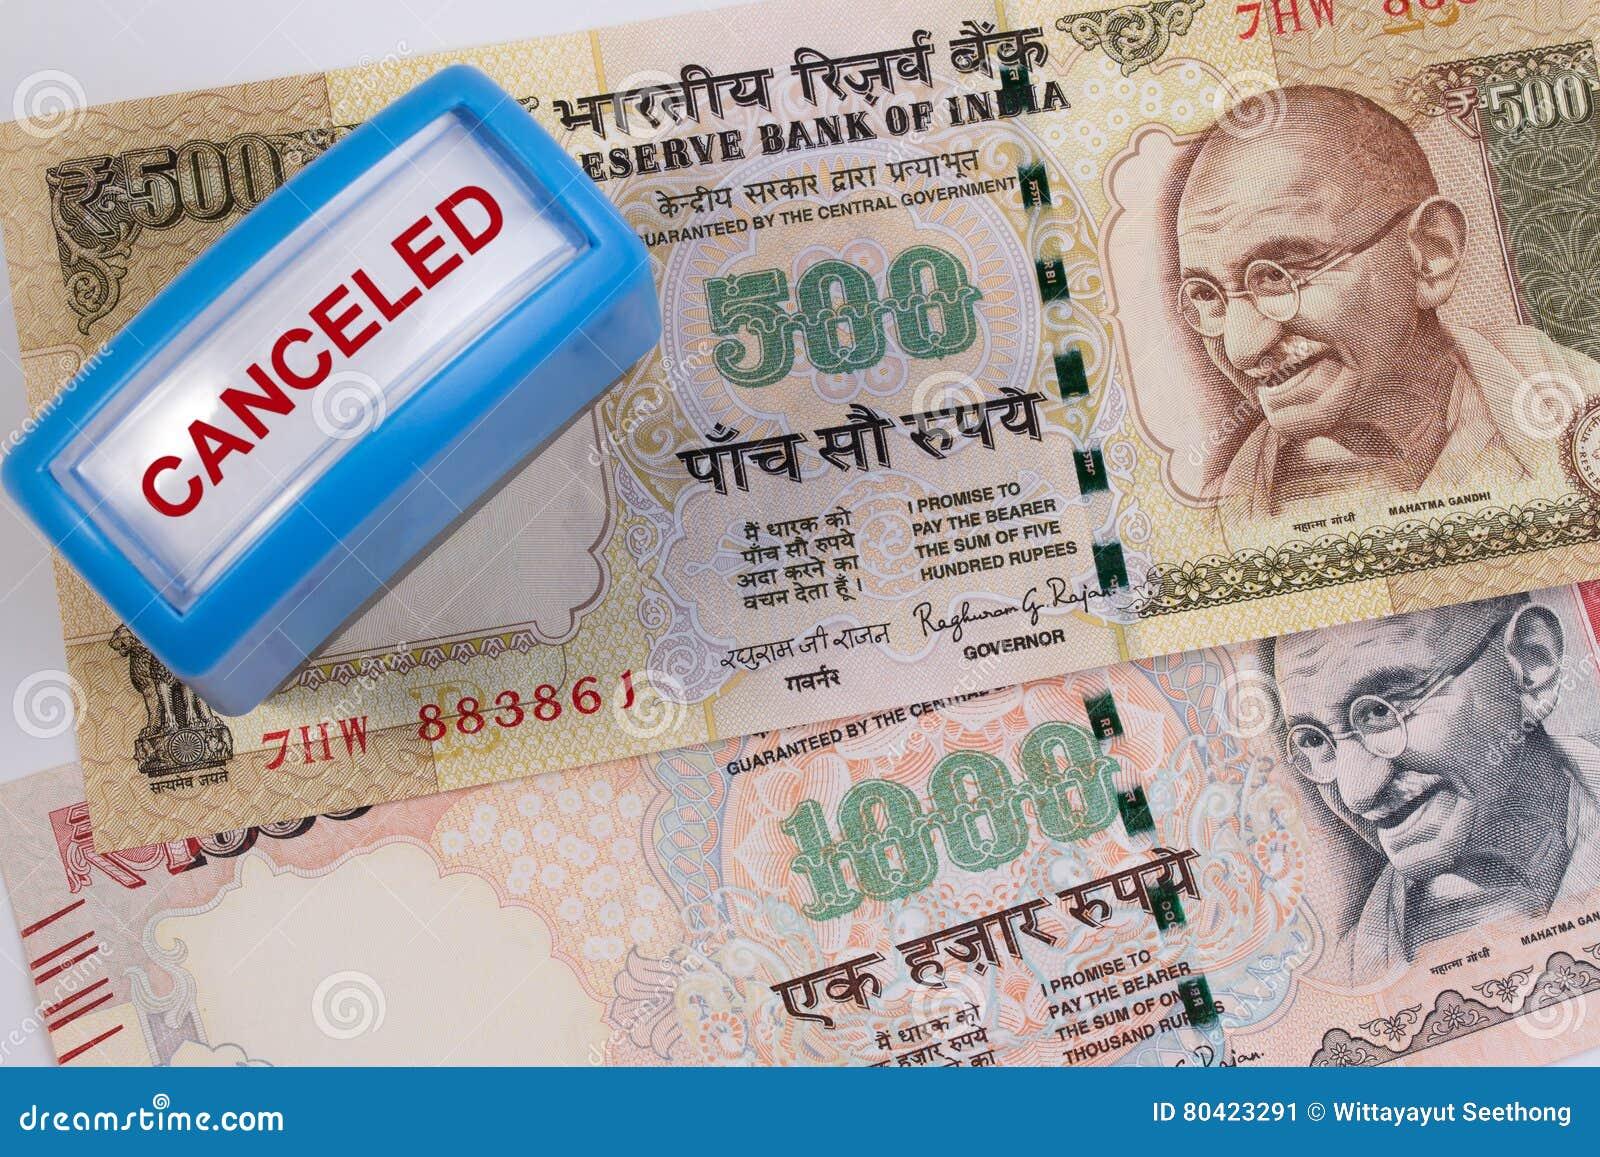 Canceled banknote concept. Mahatma Gandhi on Indian 500, 1000 rupee banknote canceled.